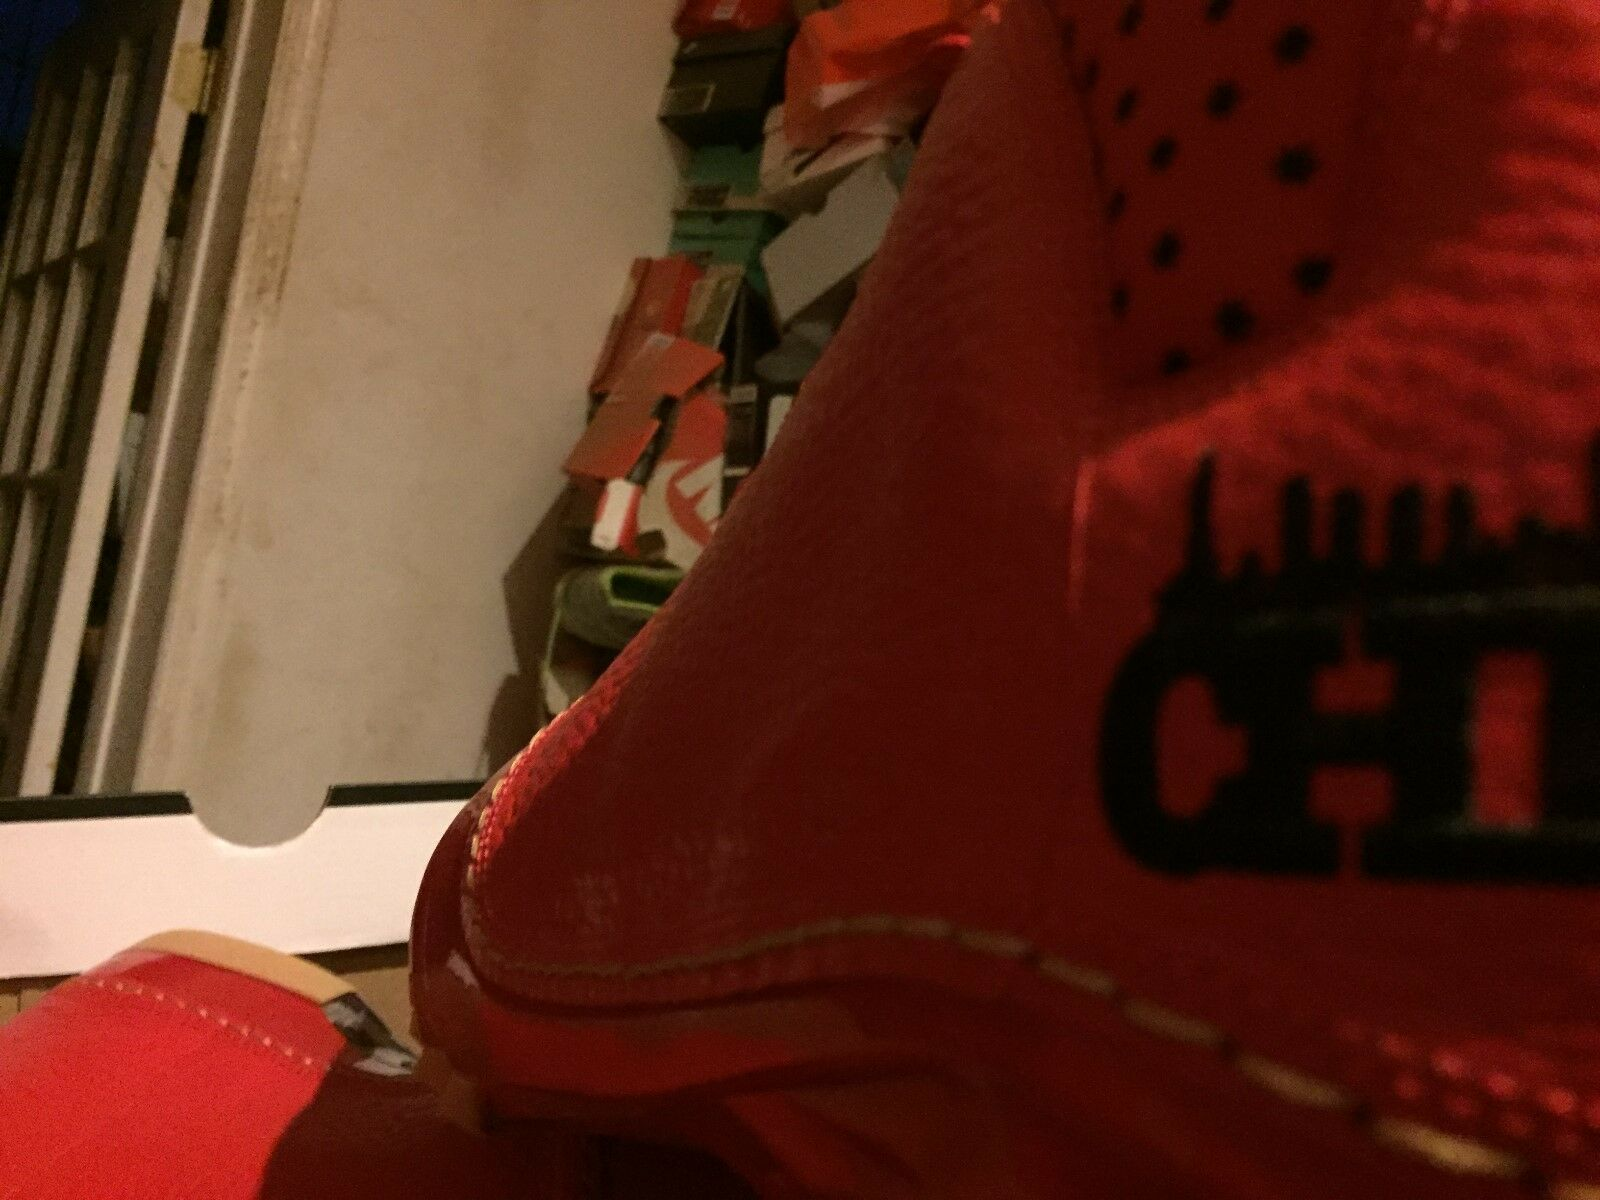 nike air jordan xx3 chicago bnib rot - rot / 650 kaugummi größe 14 811645 650 / 681947